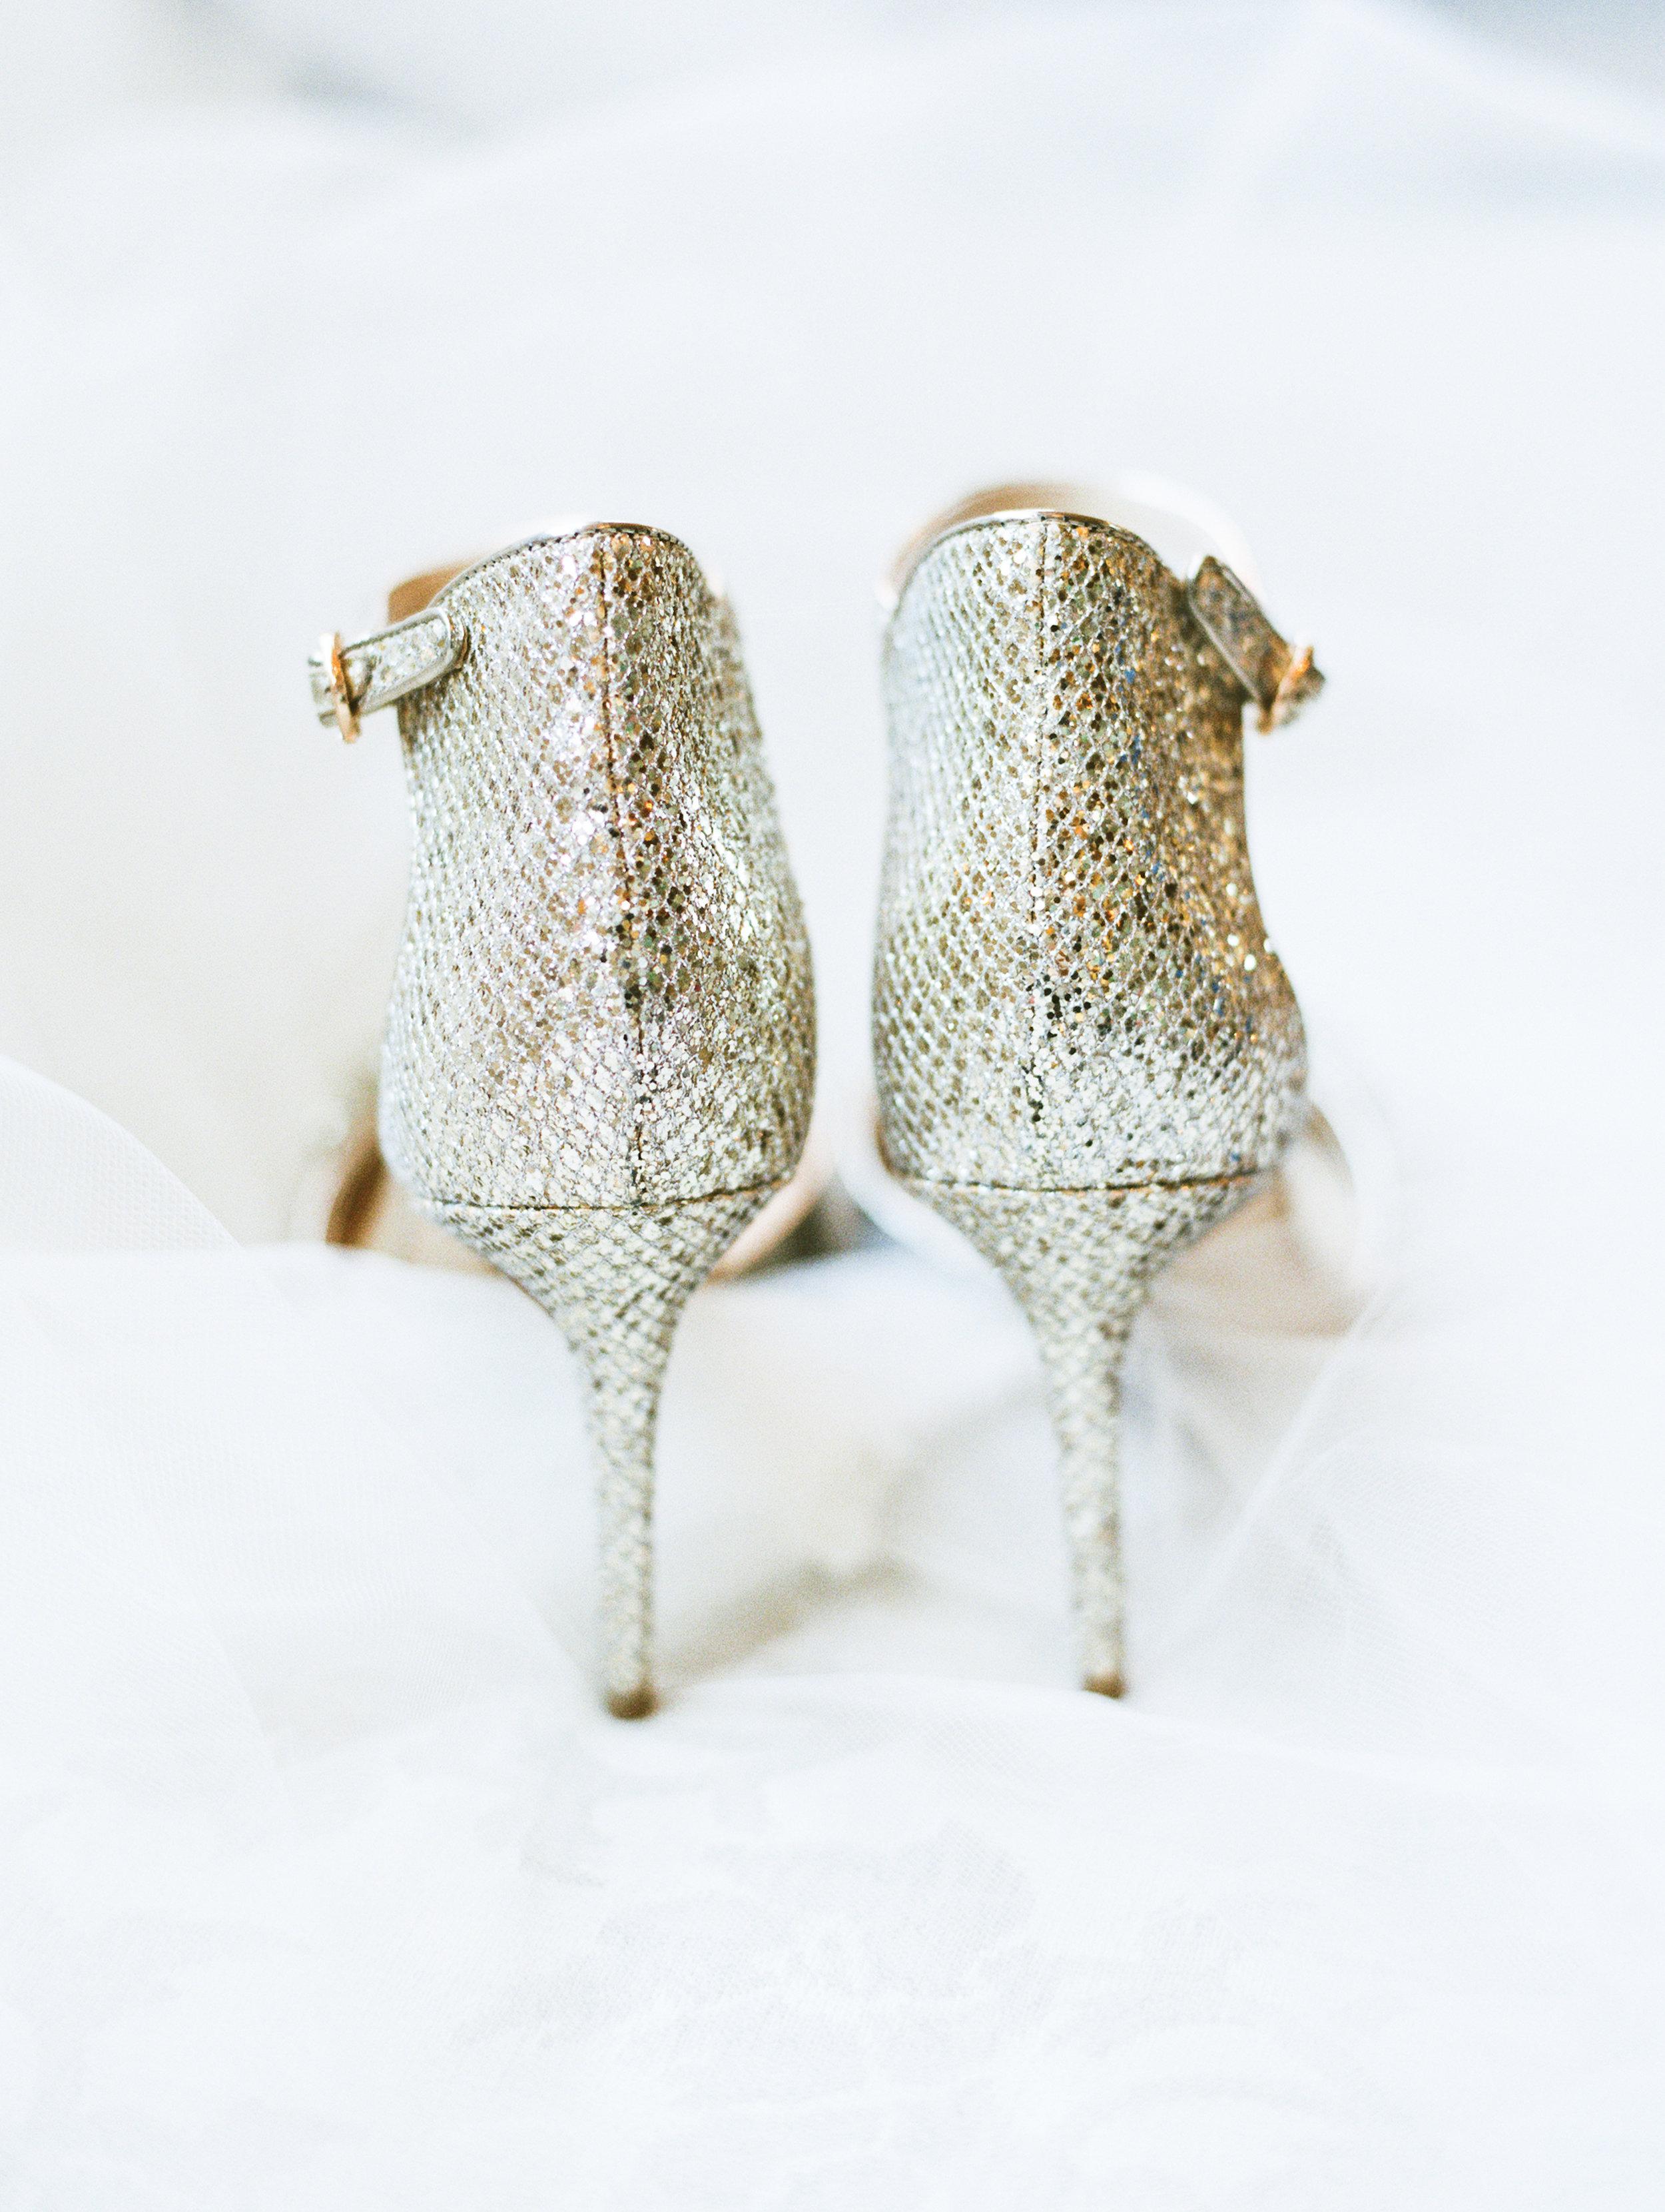 Vogelzang+Wedding+Details+b-40.jpg